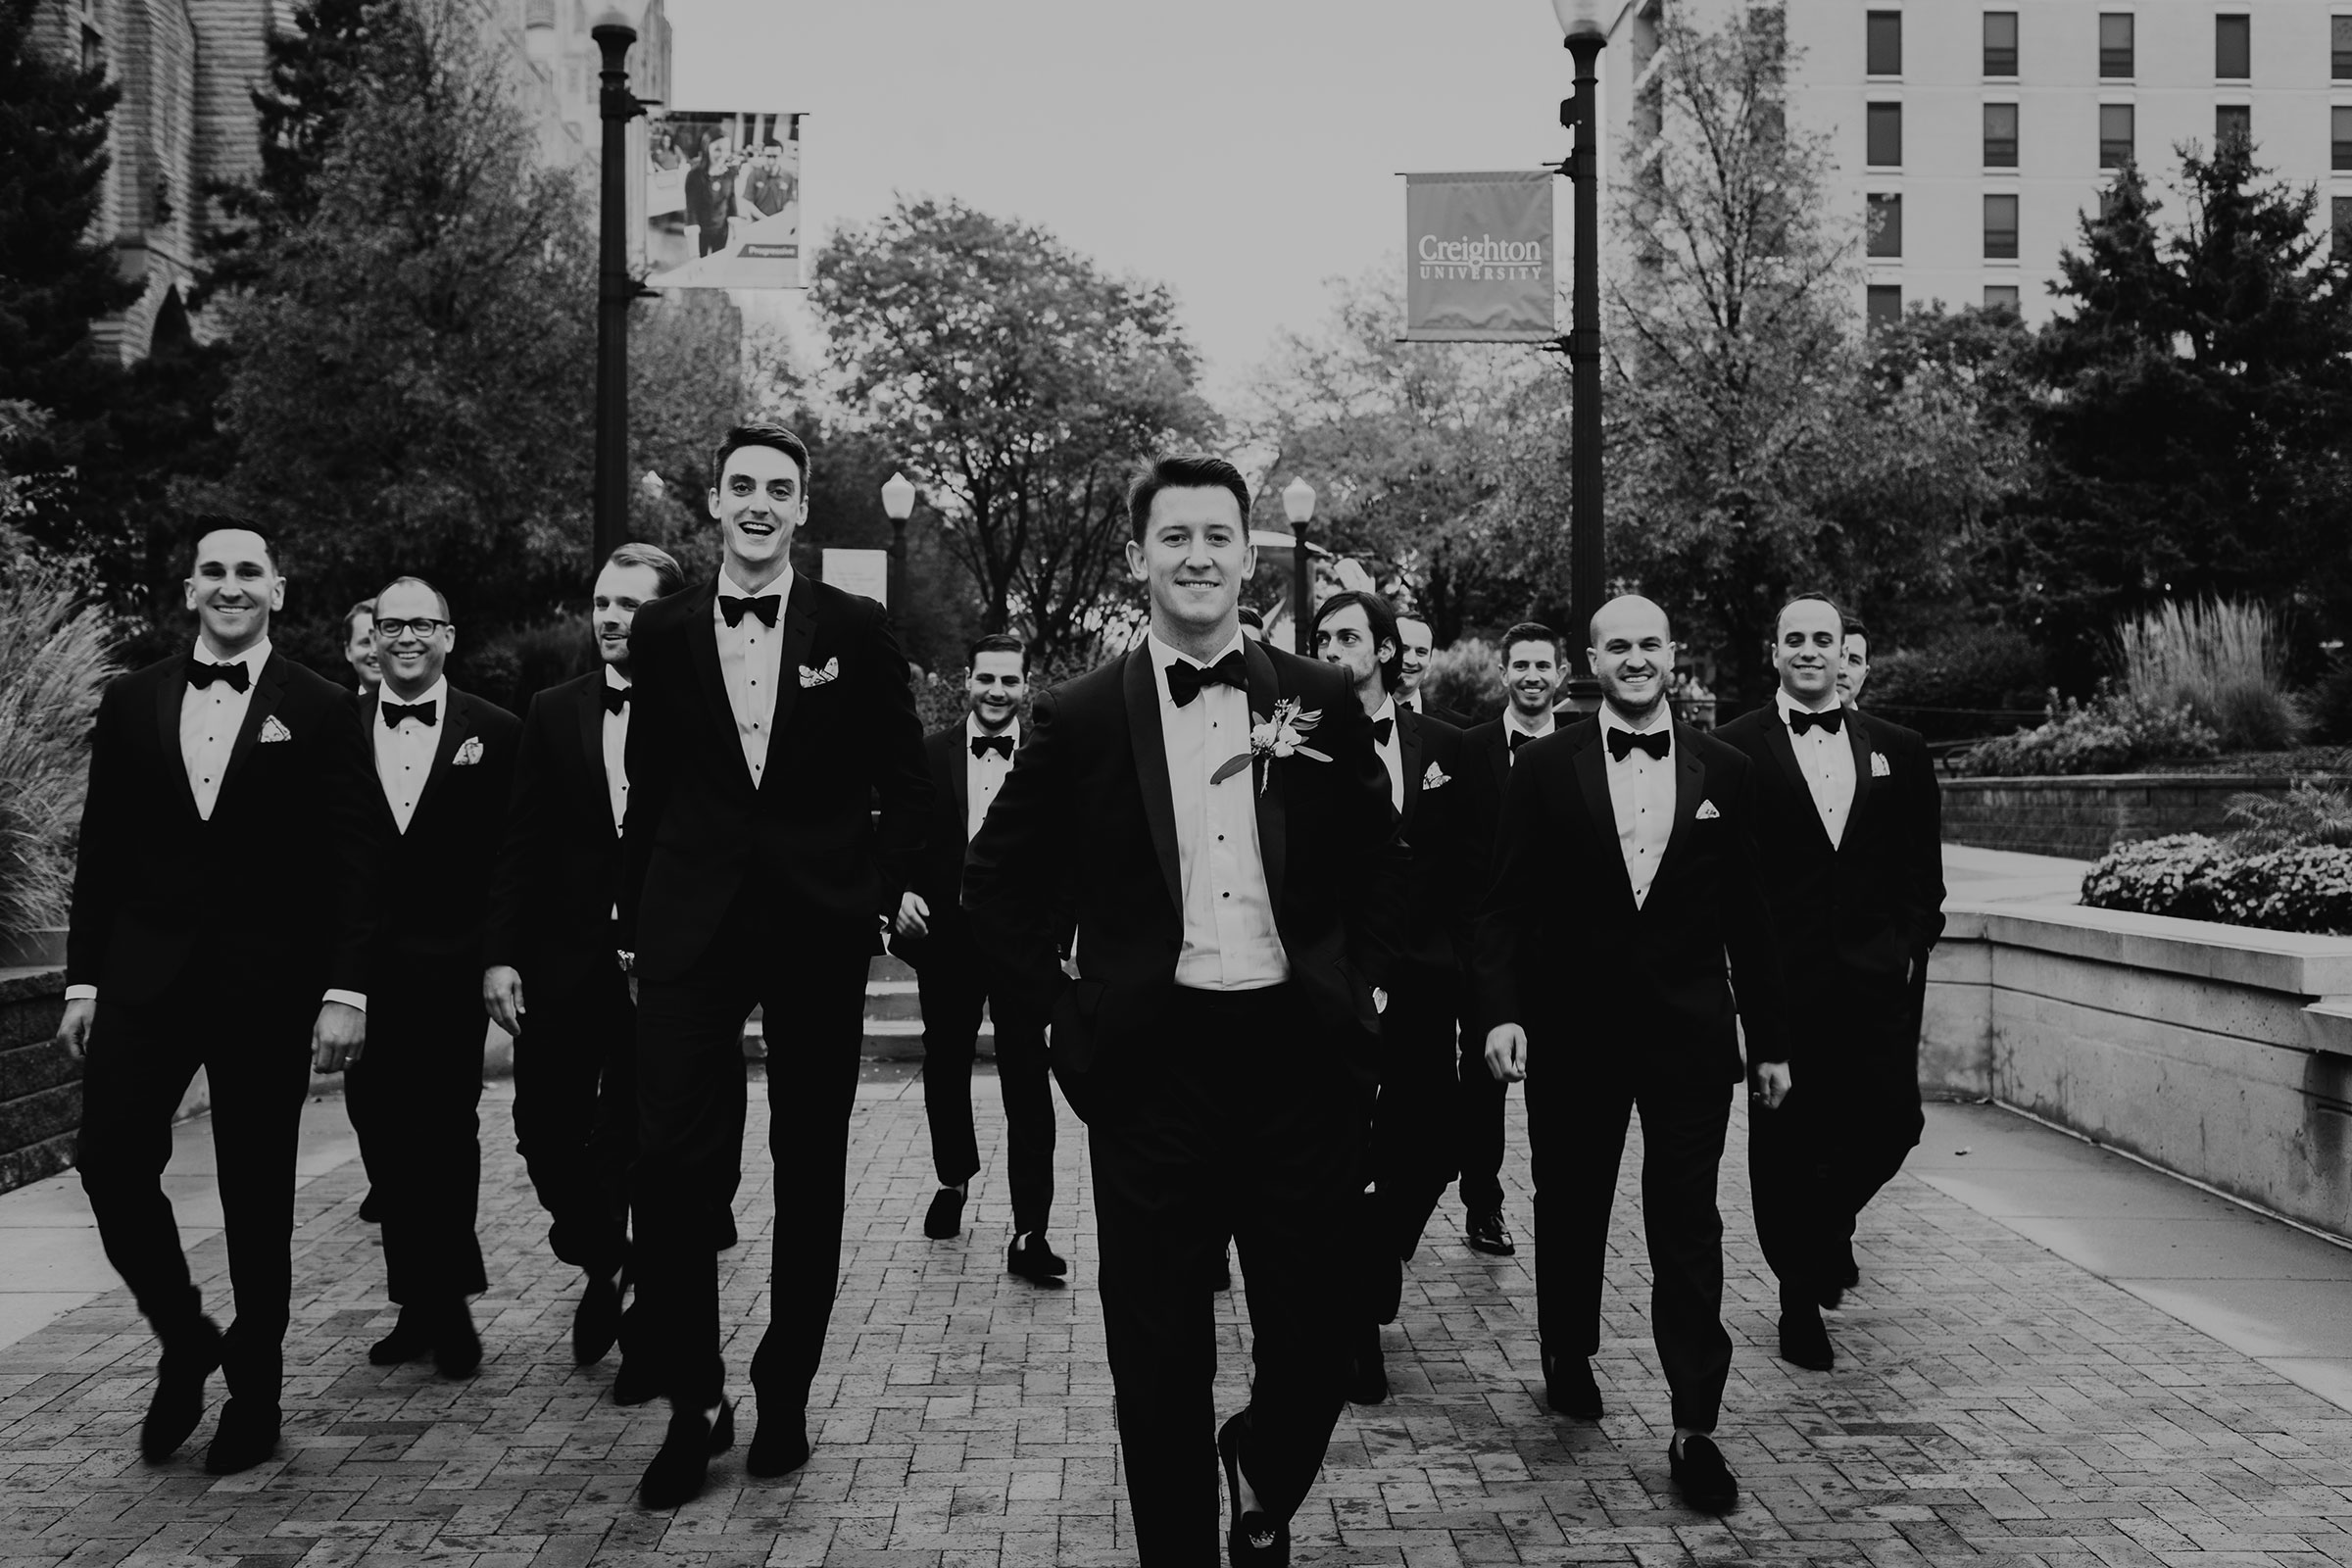 groom-and-groomsmen-walking-st-johns-church-at-creighton-omaha-nebraska-raelyn-ramey-photography.jpg